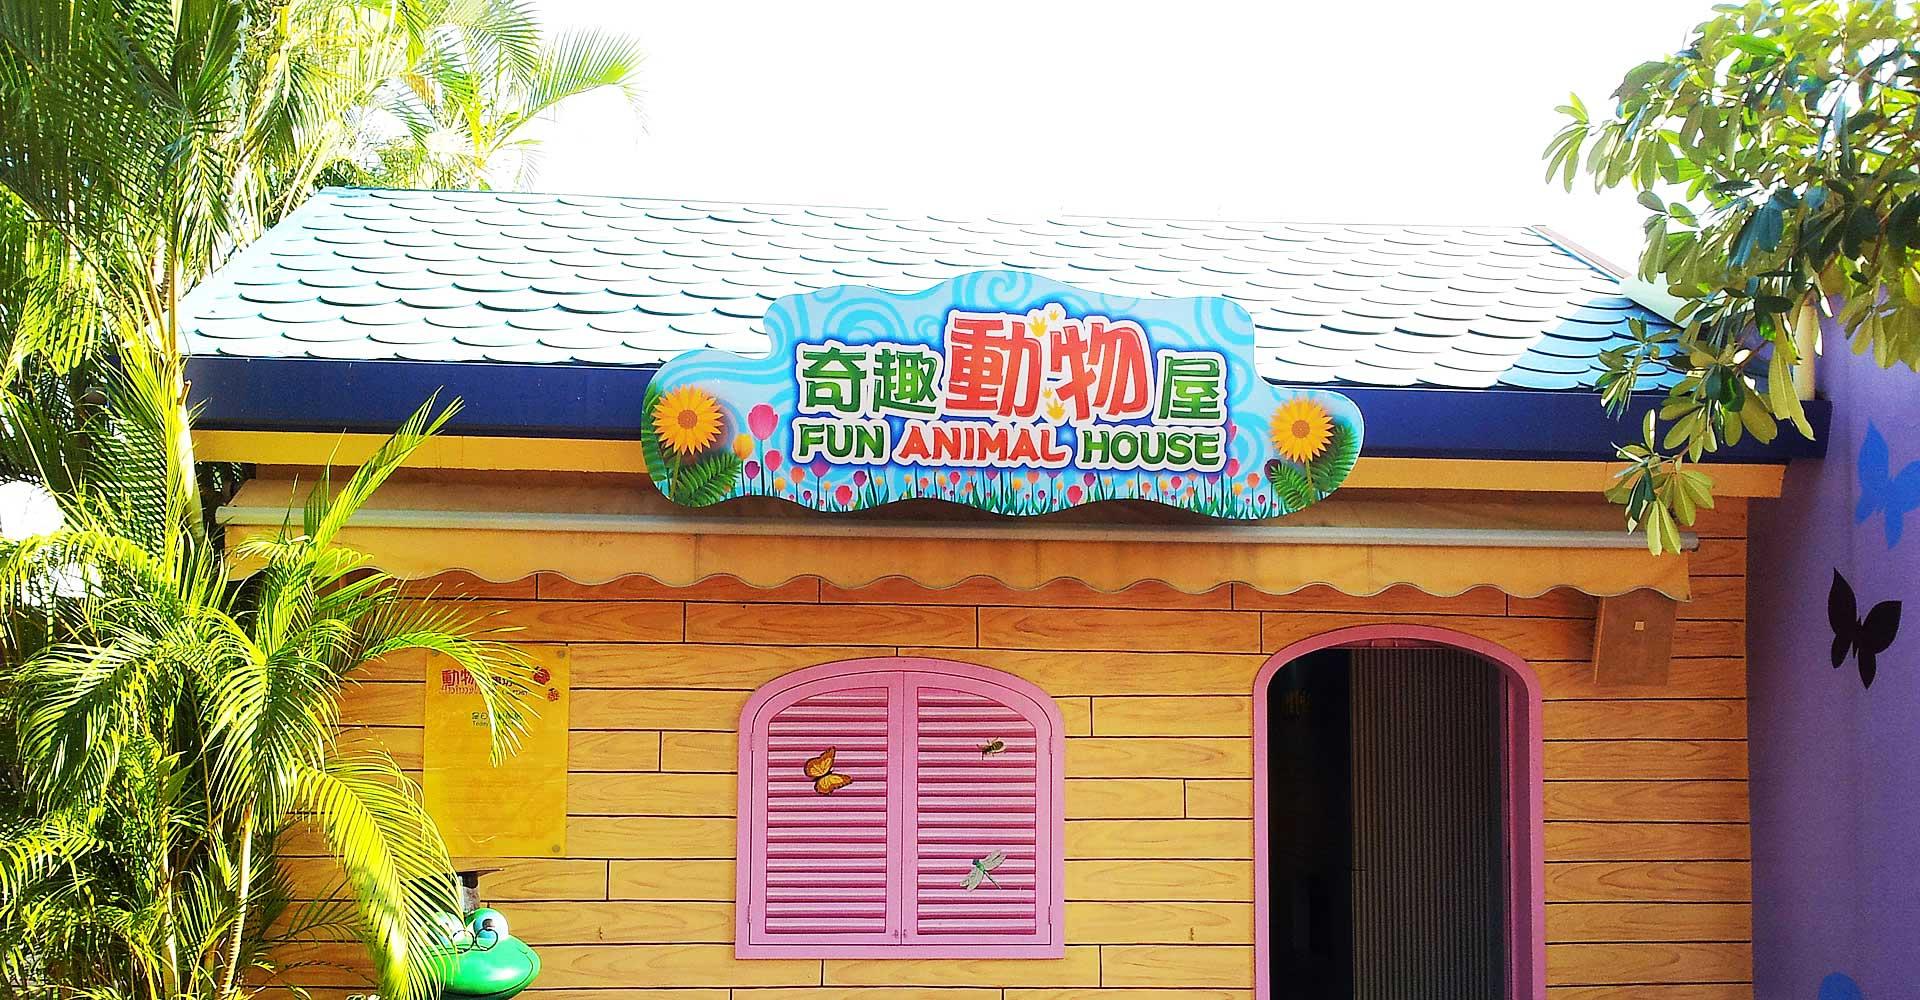 https://media.oceanpark.com.hk/files/s3fs-public/animal_fun_house1.jpg